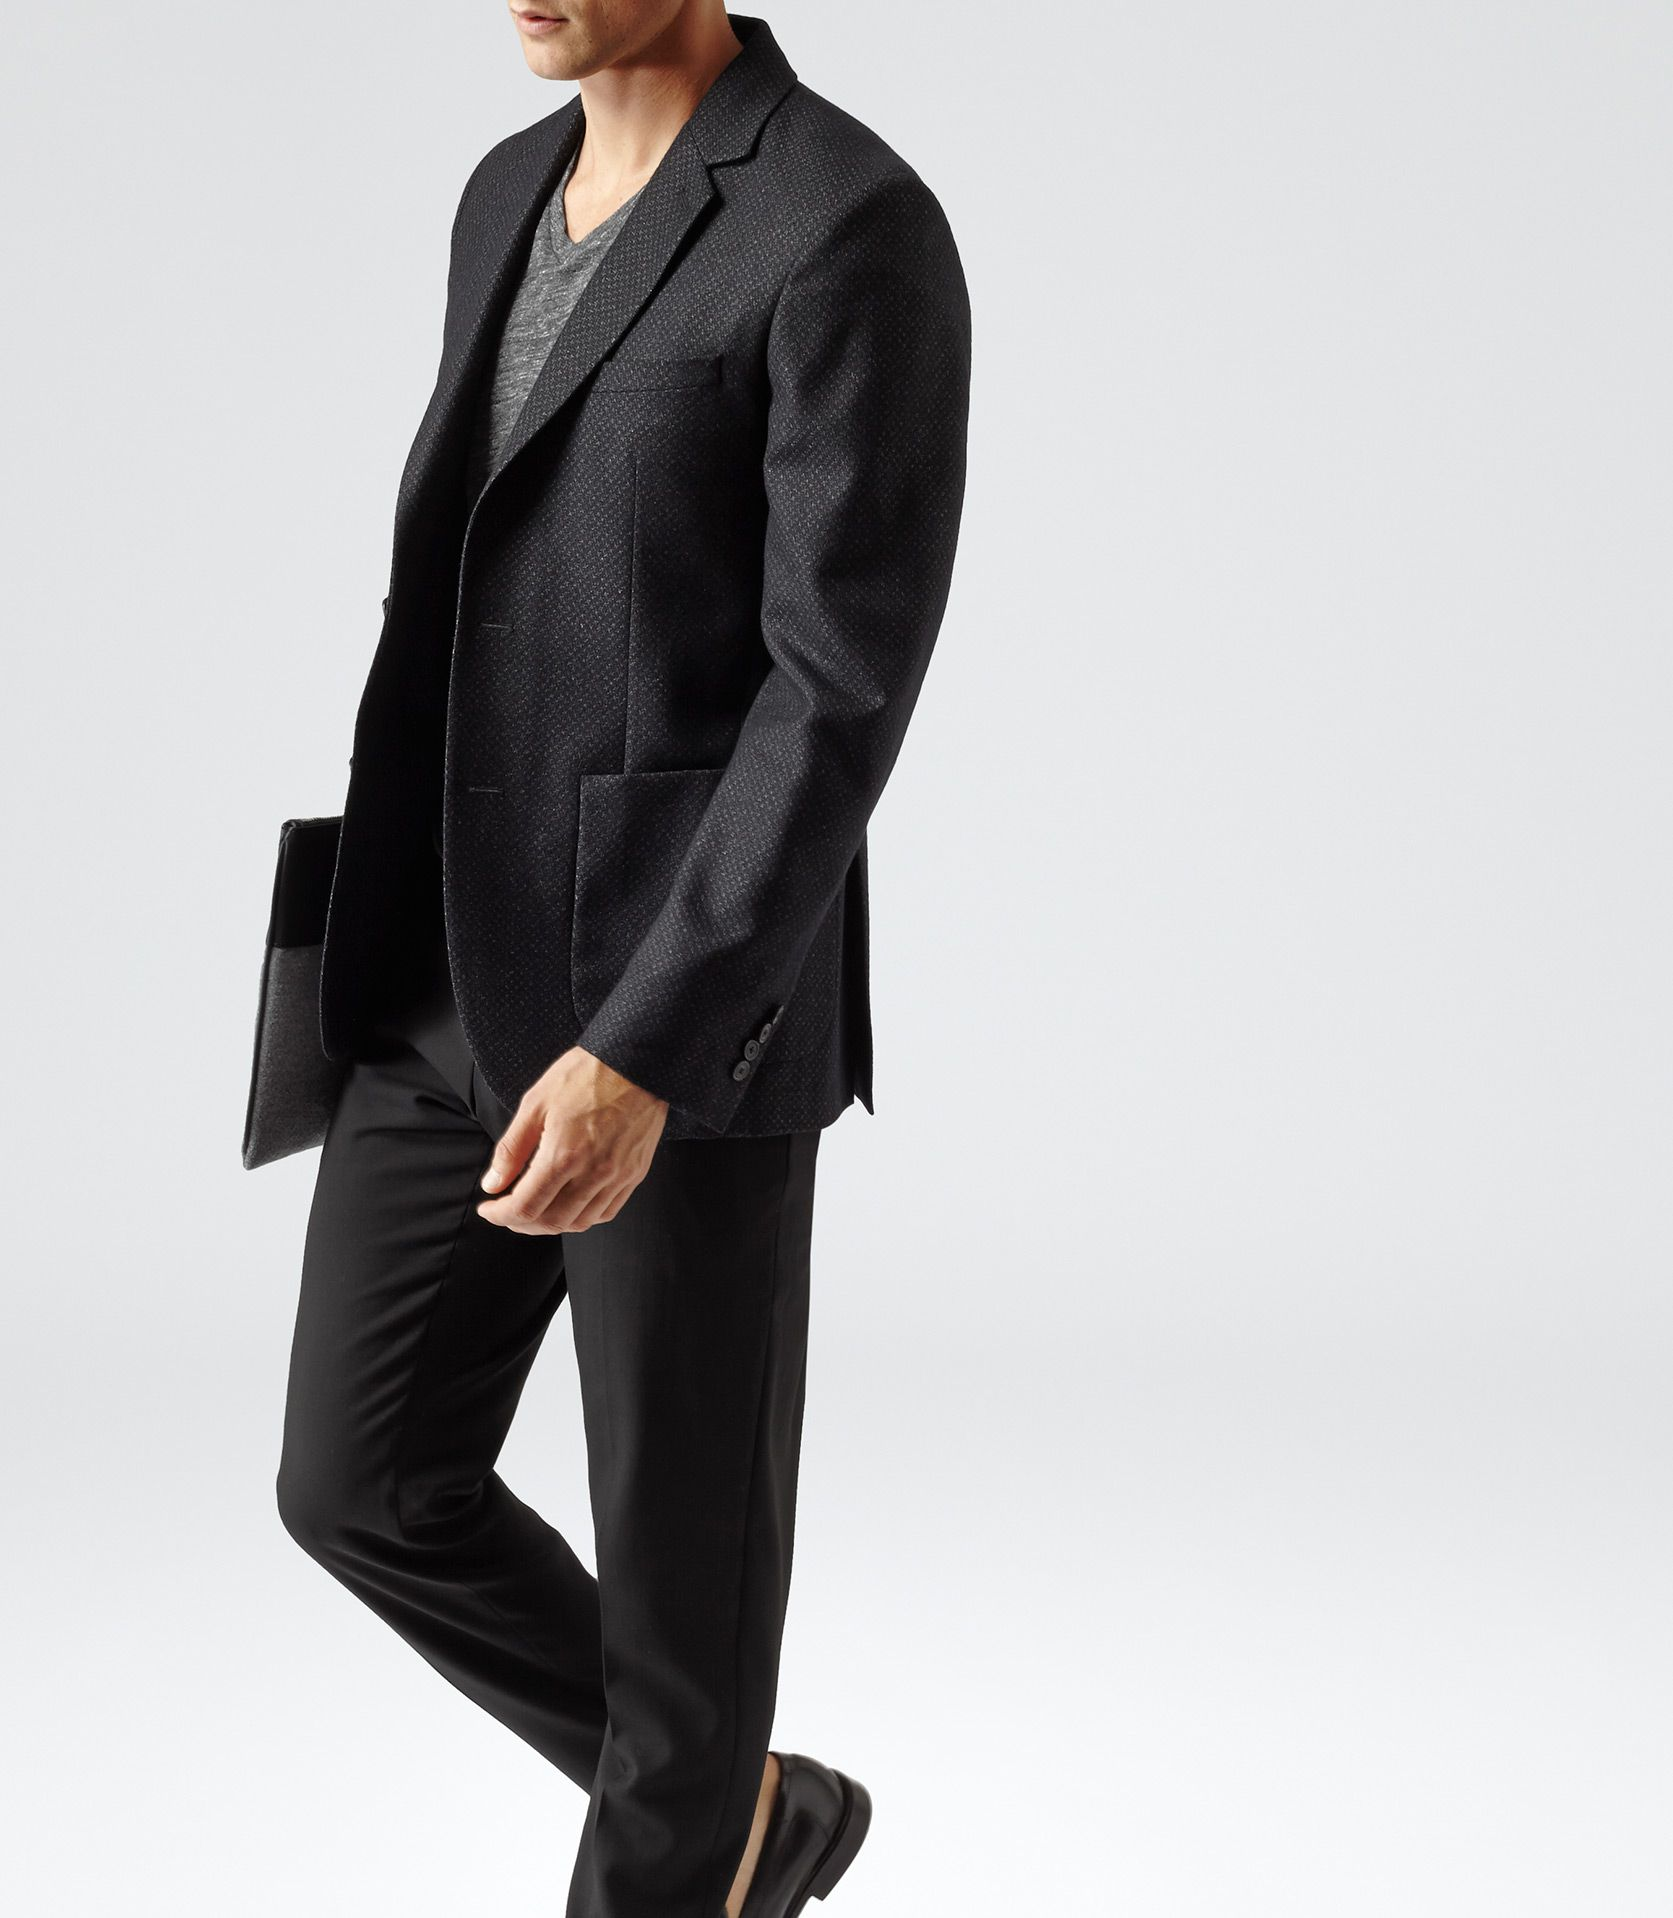 88701c1db08342 Mens Black Textured Two Button Blazer - Reiss California